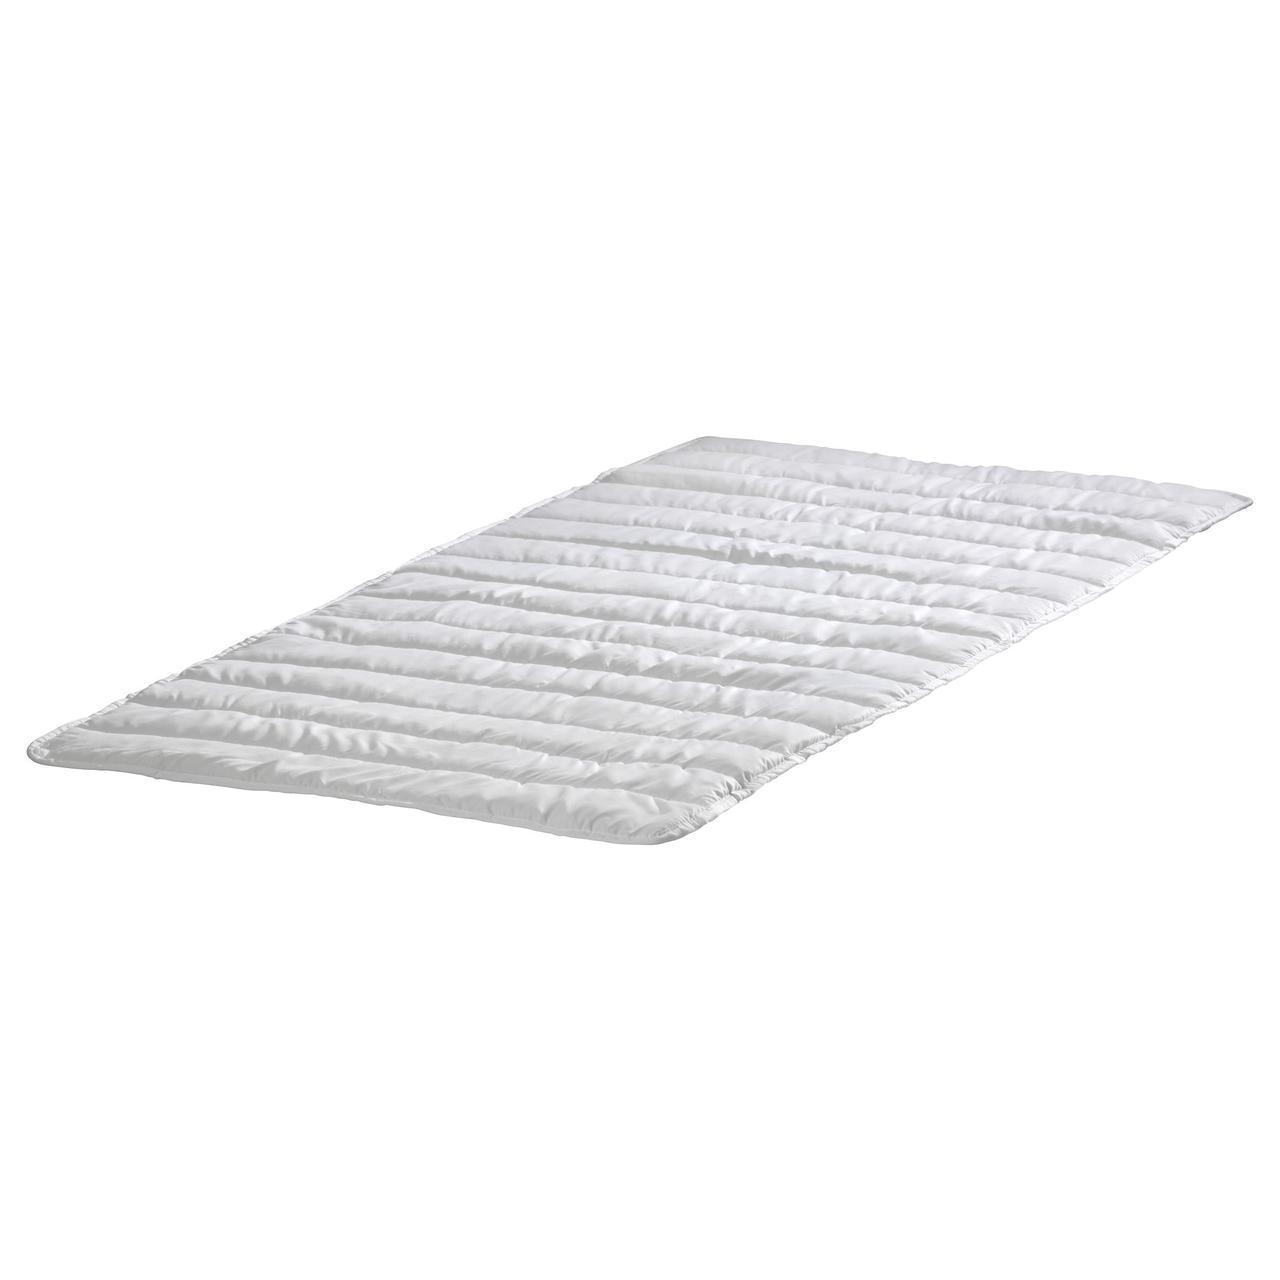 ✅ IKEA NATTLIG (702.531.26) Наматрасник, водоотталкивающий